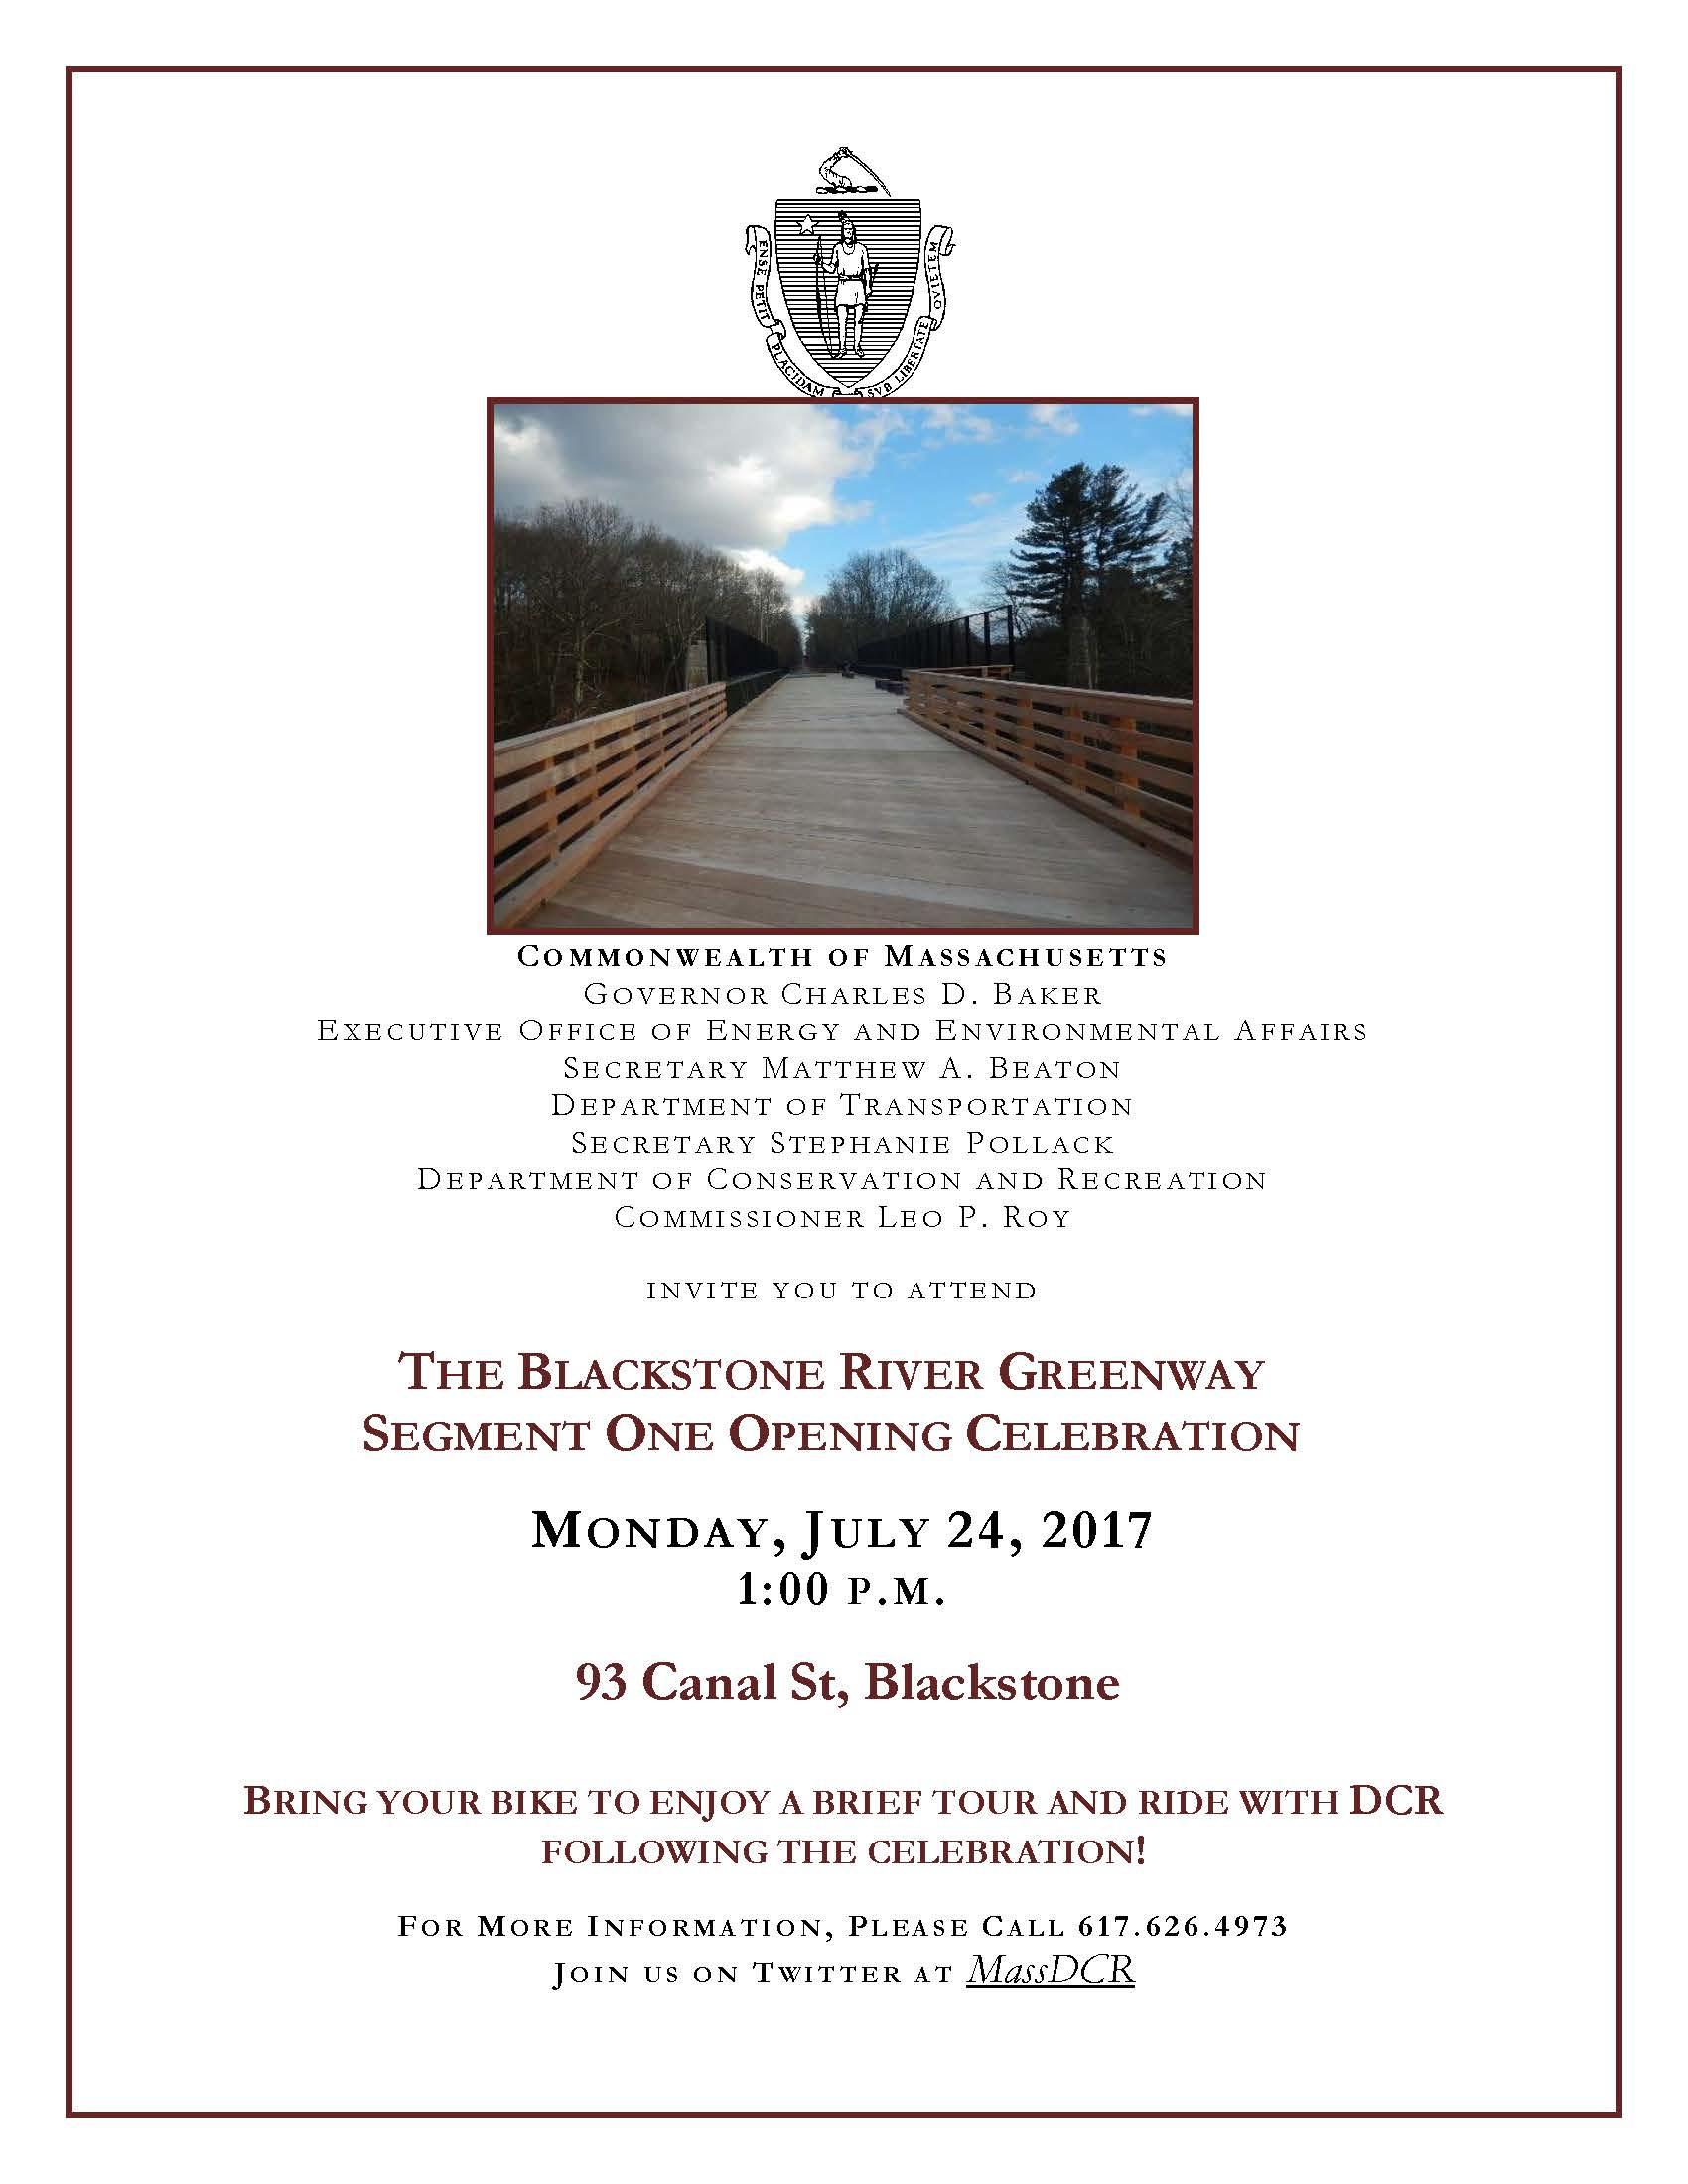 Blackstone River Greenway Segment One Opening Celebration ...